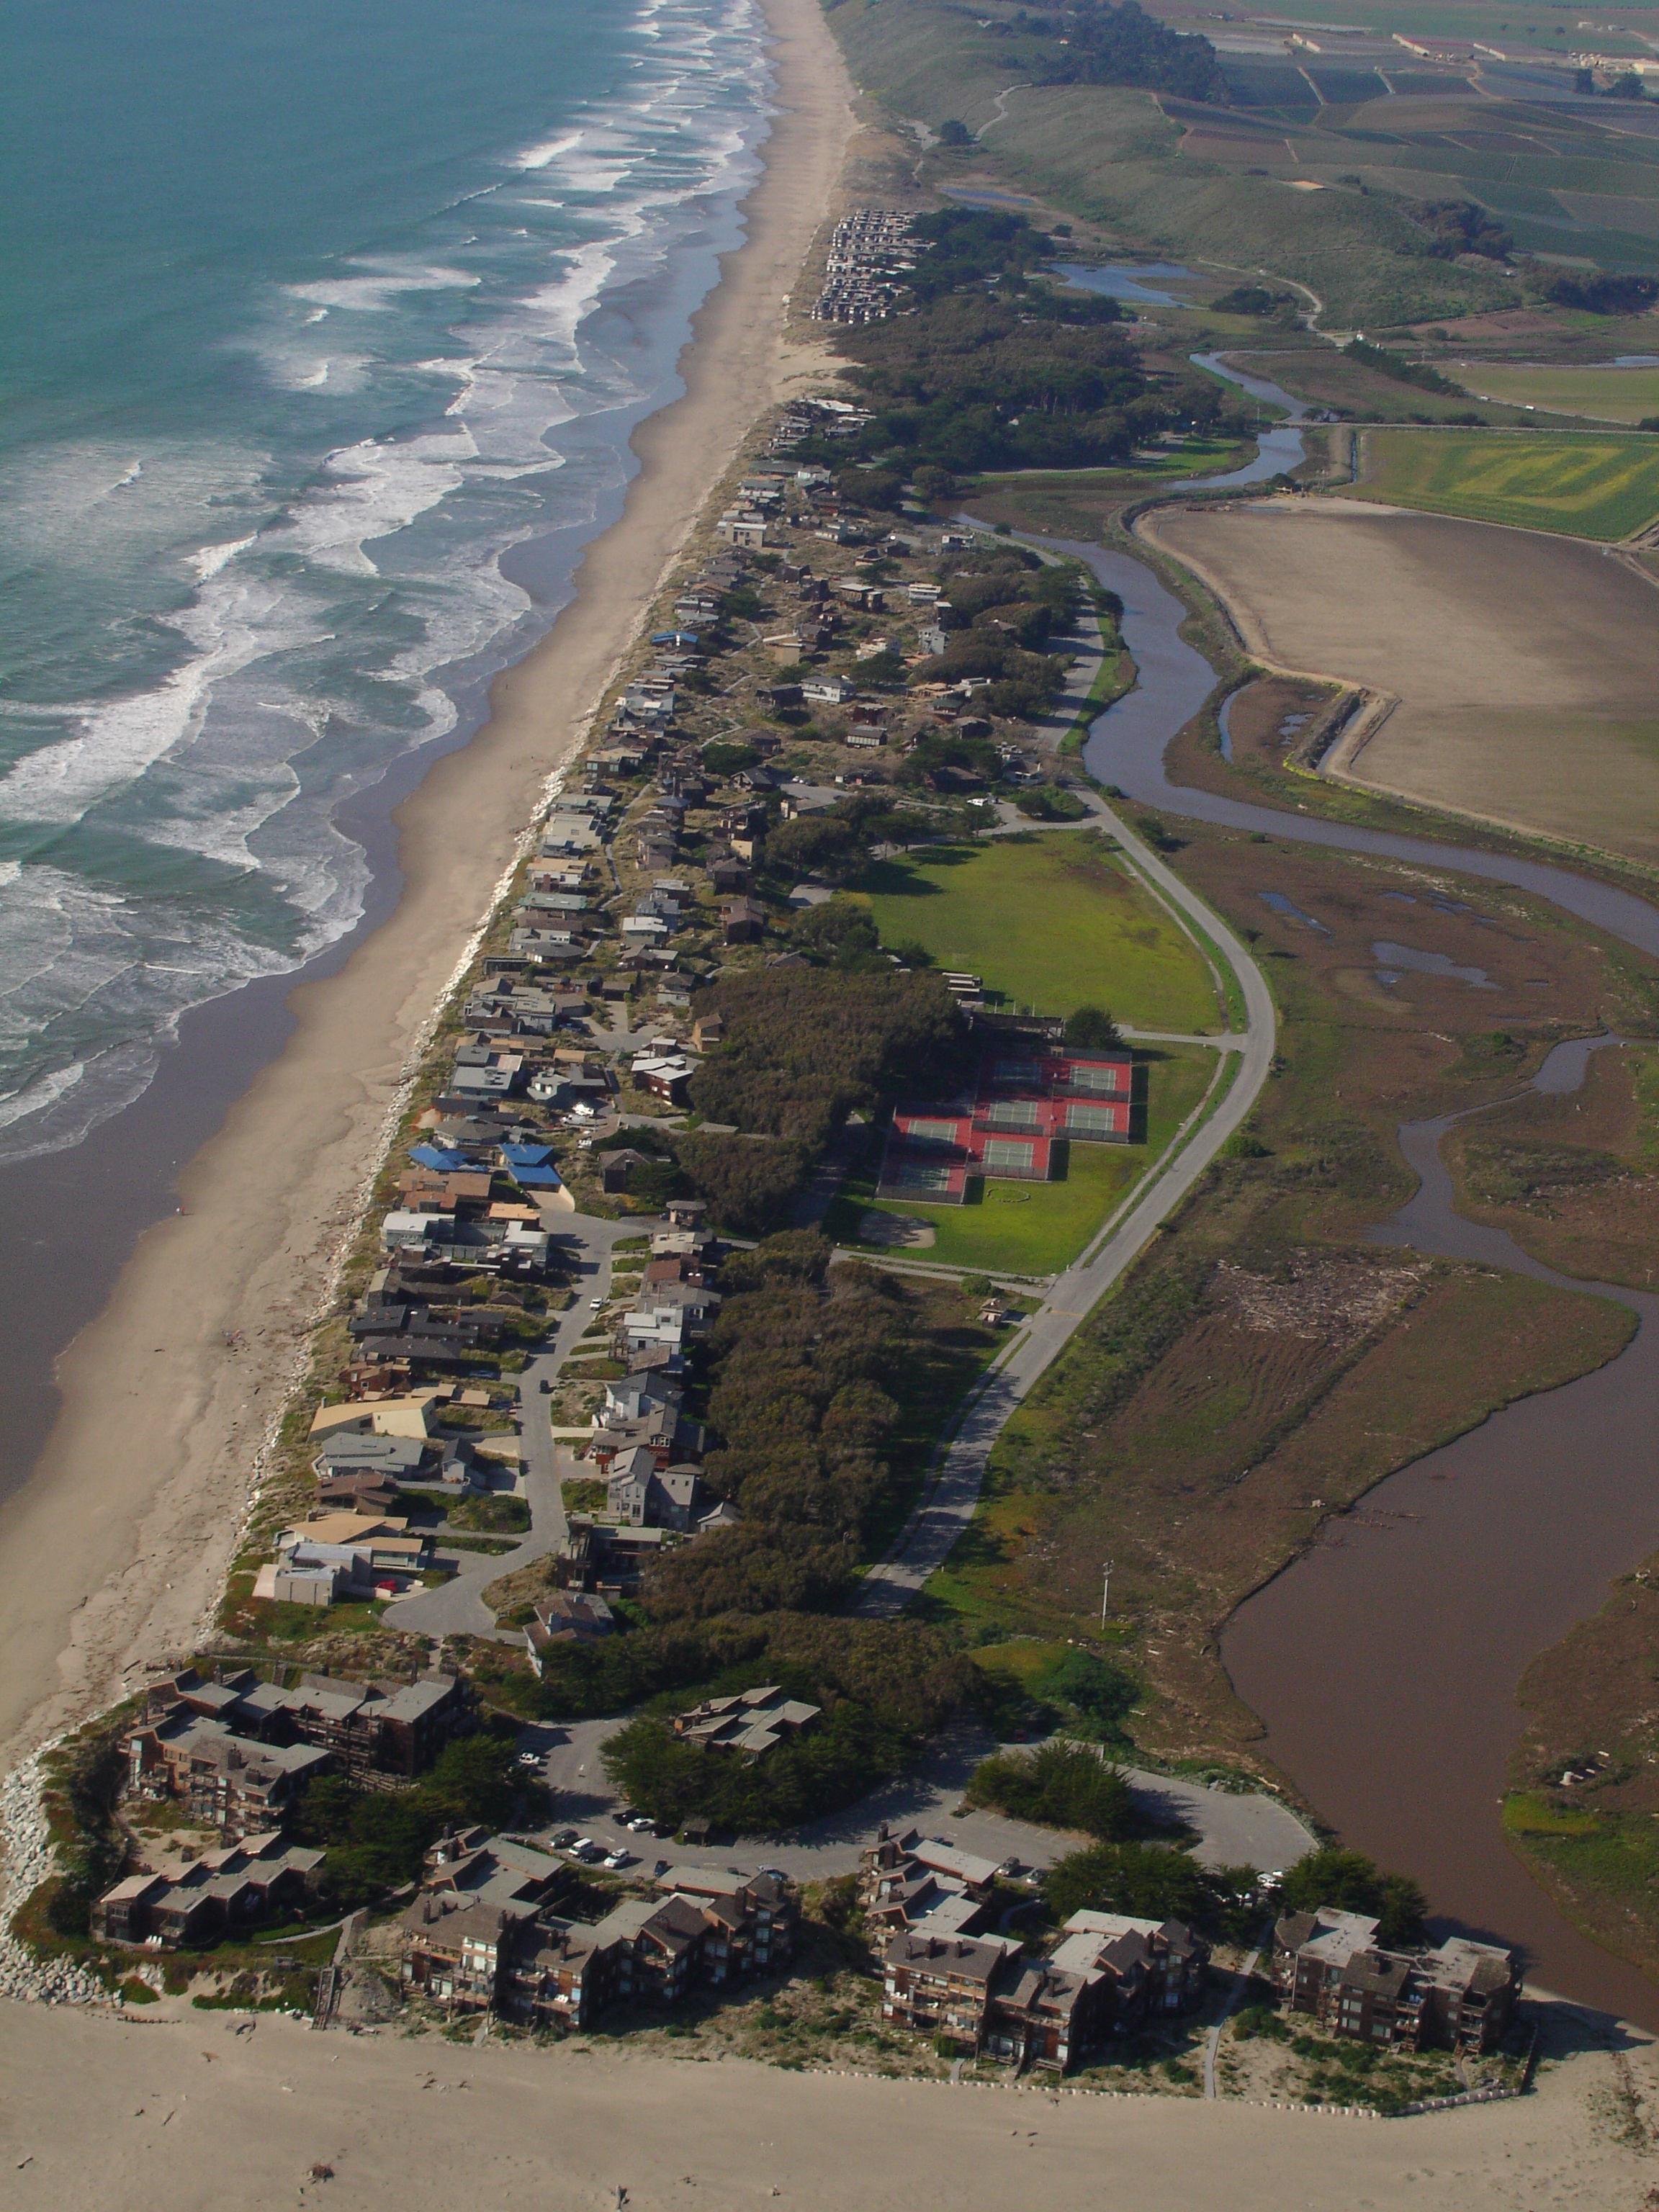 Pajaro Dunes Company and Resort image 6